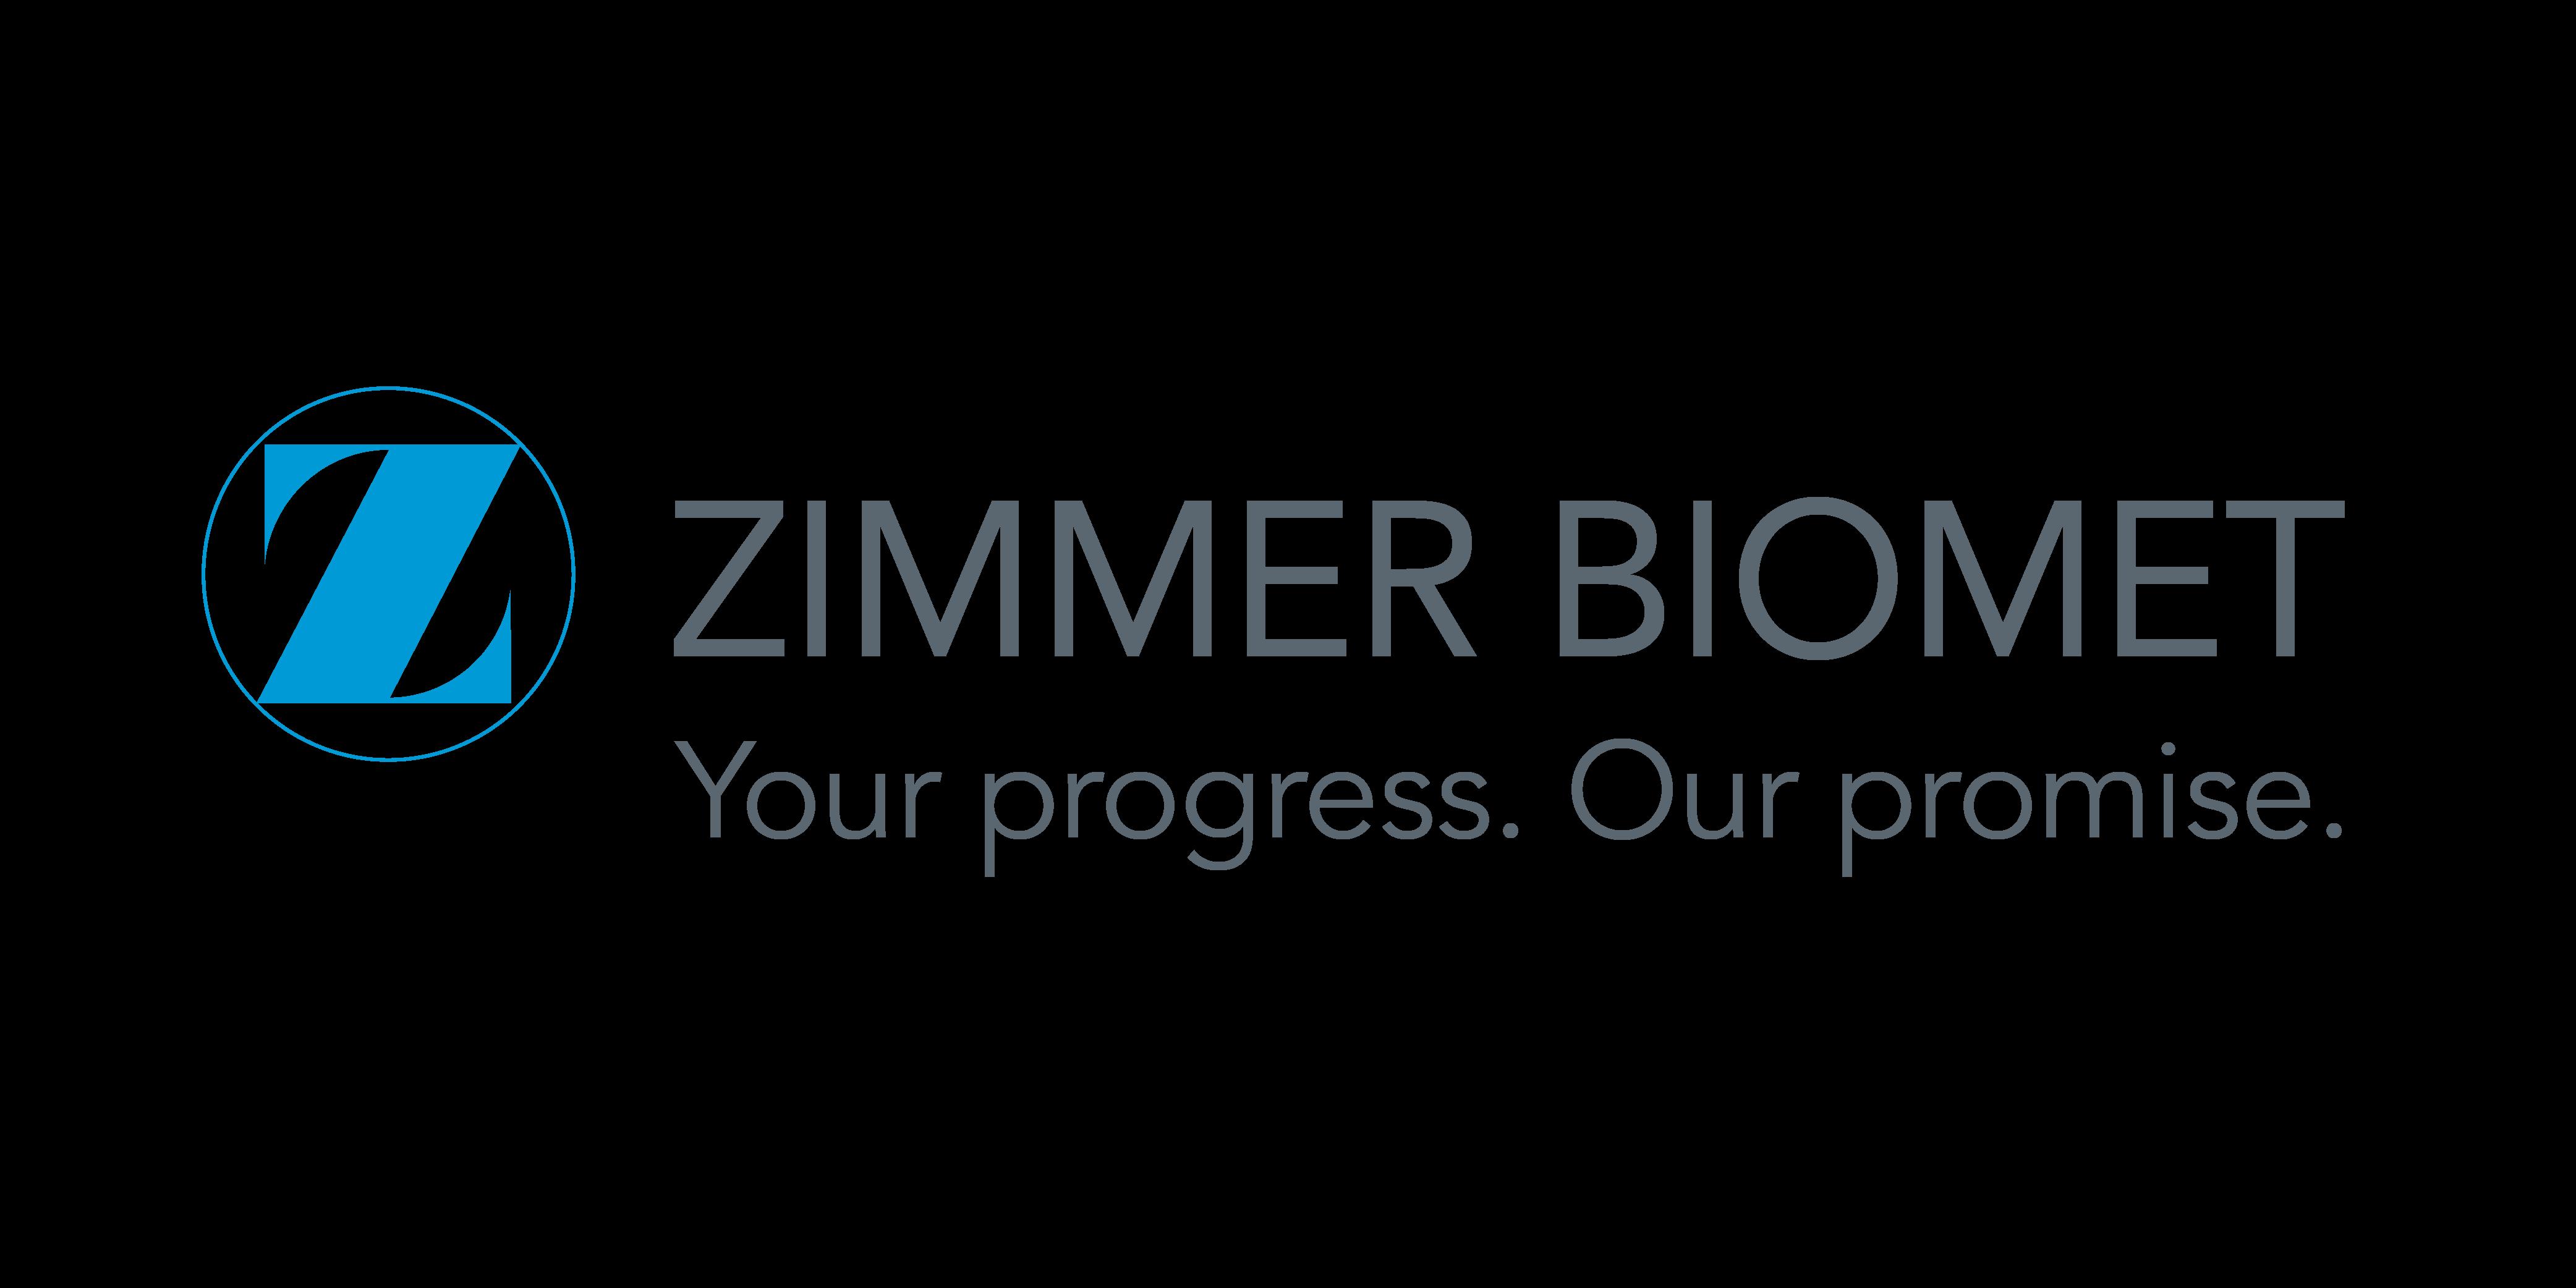 zimmer-biomet-socio-comercial-artrolife-01